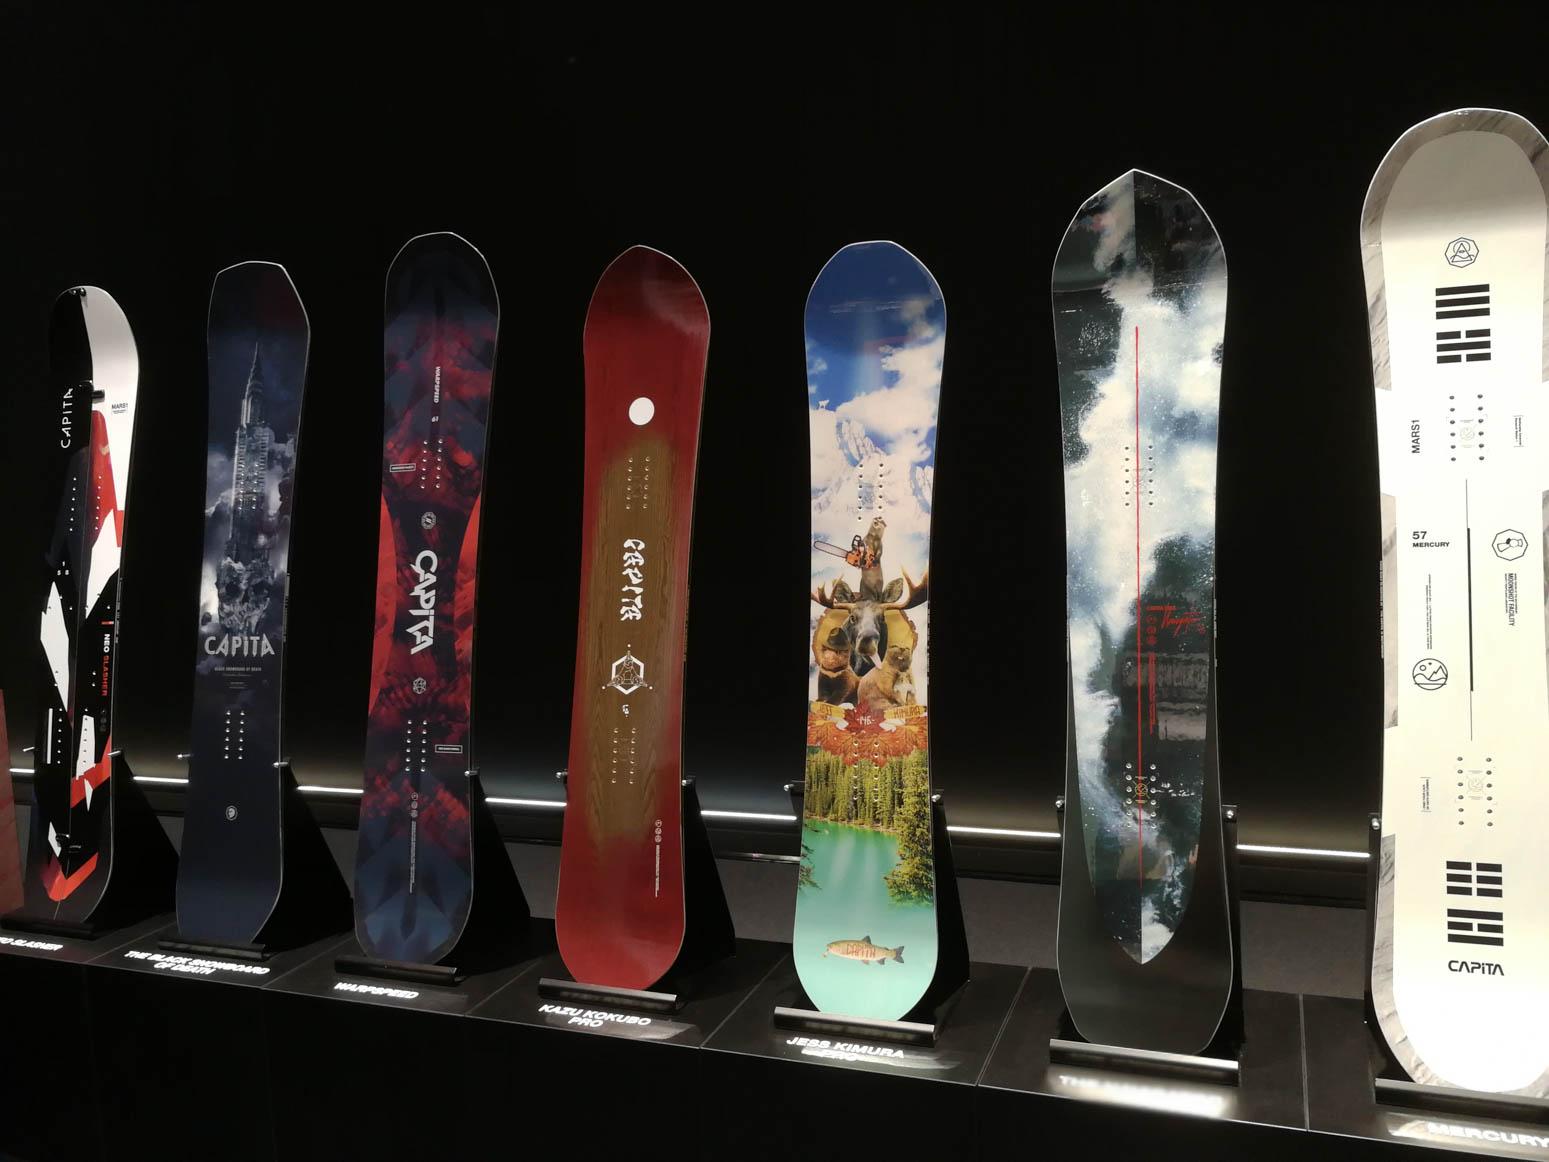 Capita (links nach rechts): Neo Slasher, Black Snowboard of Death 18/19, Warpspeed, Kazu Kobubo Pro, Jess Kimura Pro, The Navigator, Mercury